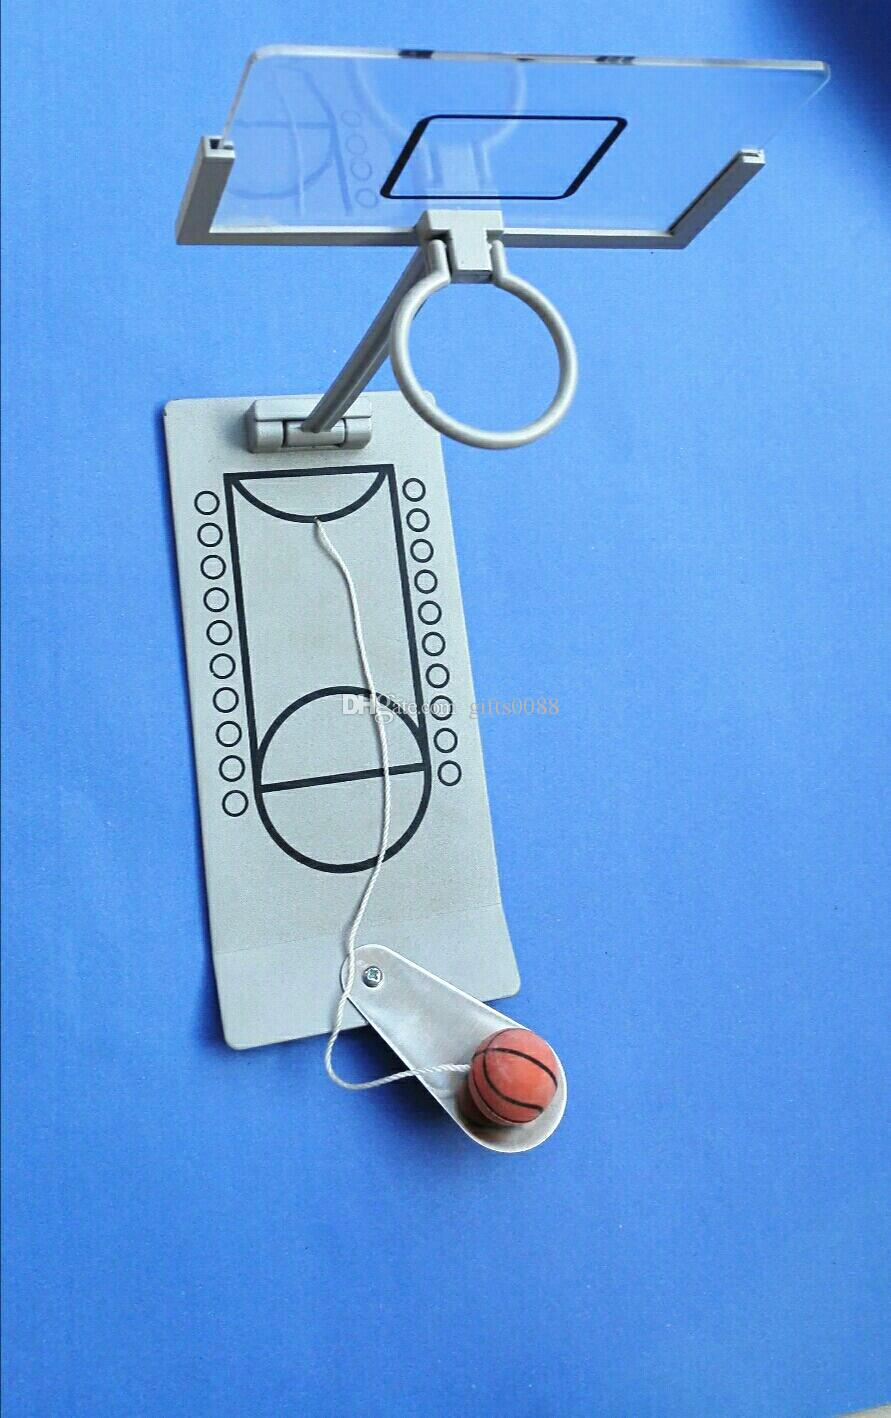 Fun Mini Finger Basketball toys for children Sport Game Foldable Table Spring Loaded Desktop Family antistress party